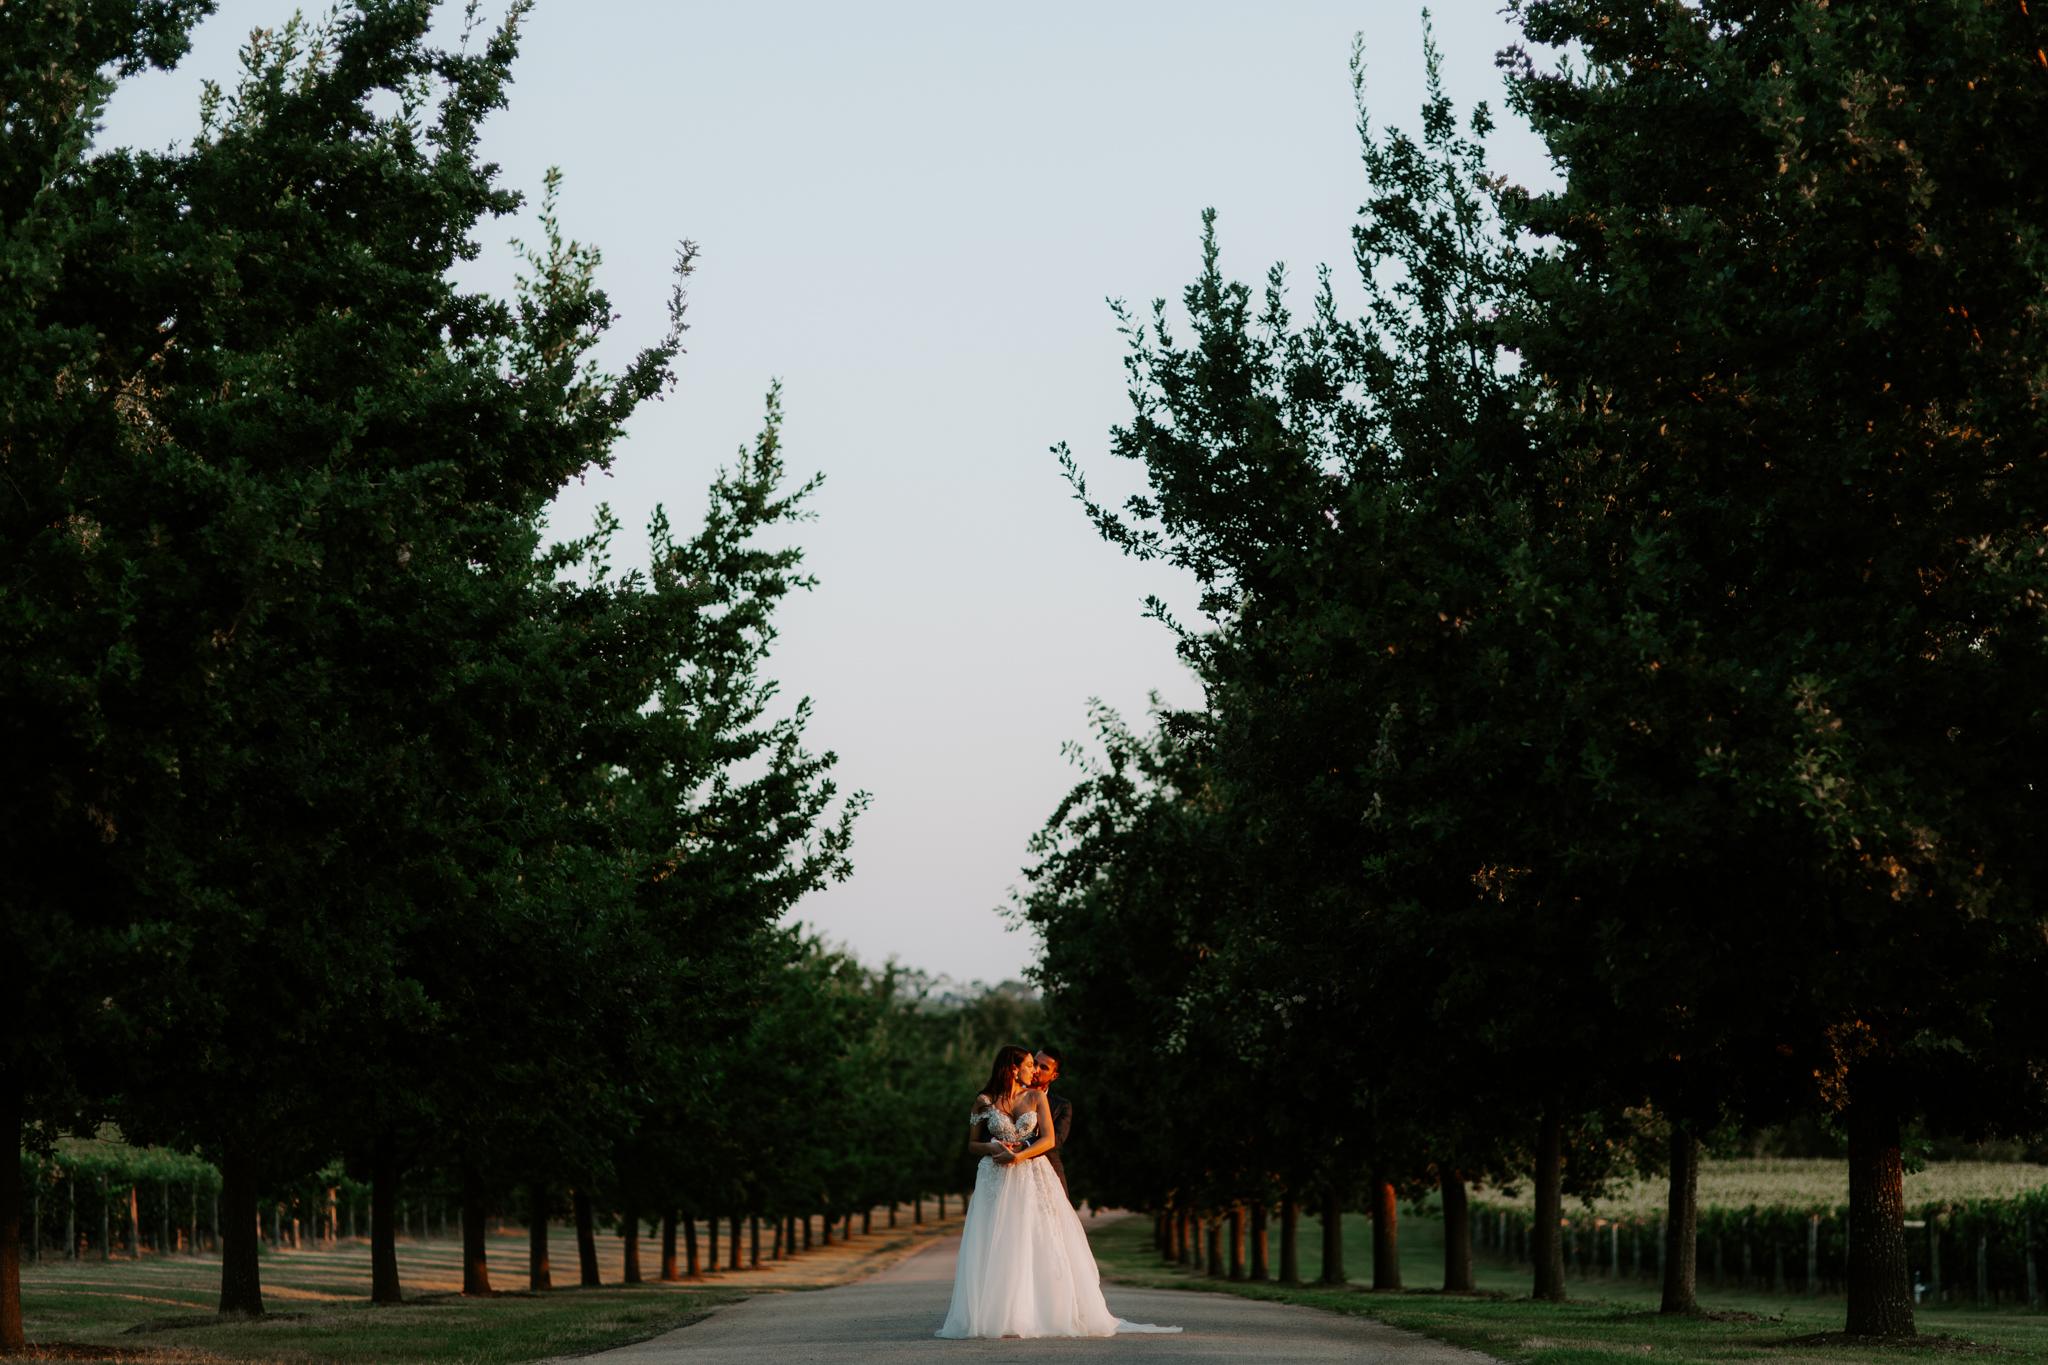 The-Stones-of-Yarra-Valley-Wedding-EmotionsandMathPhotography-217.jpg